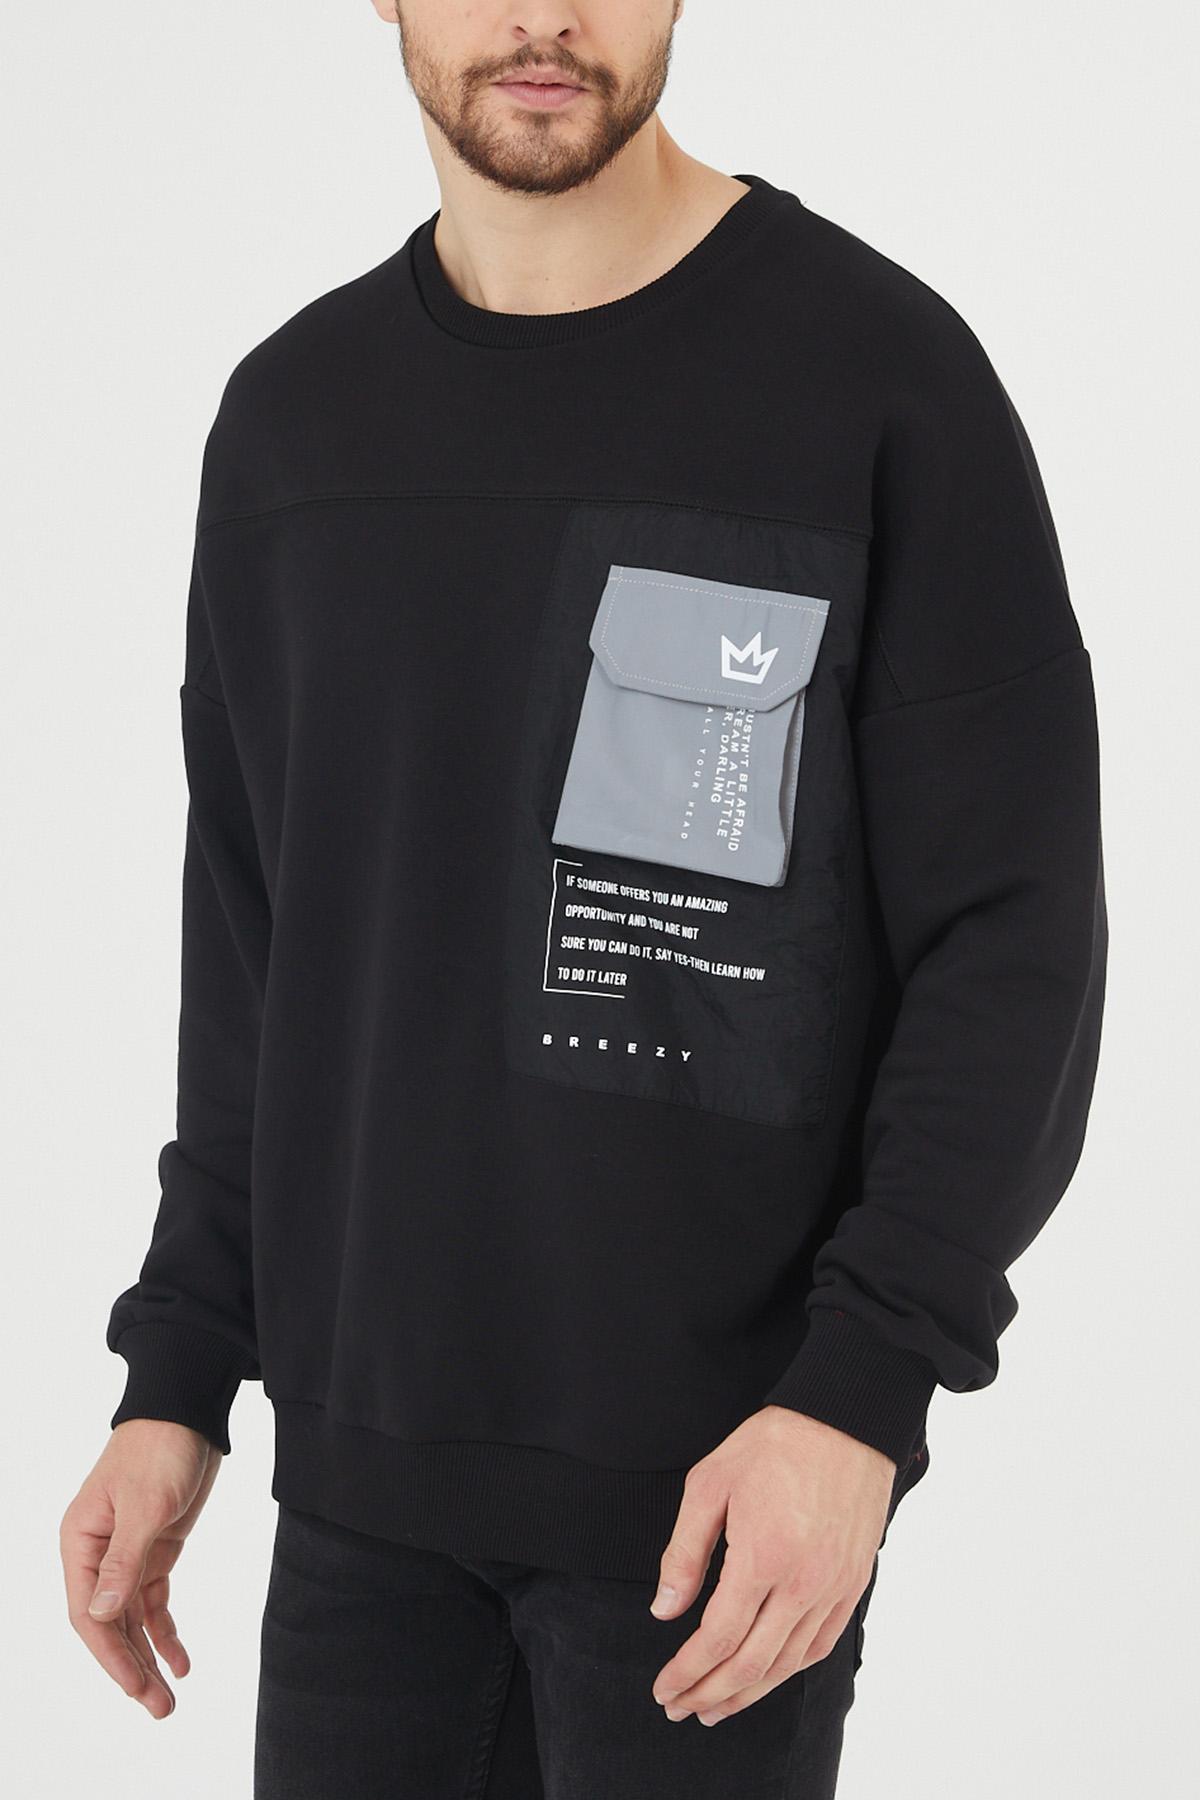 XHAN - Siyah Cep Detaylı Sweatshirt 1KXE8-44395-02